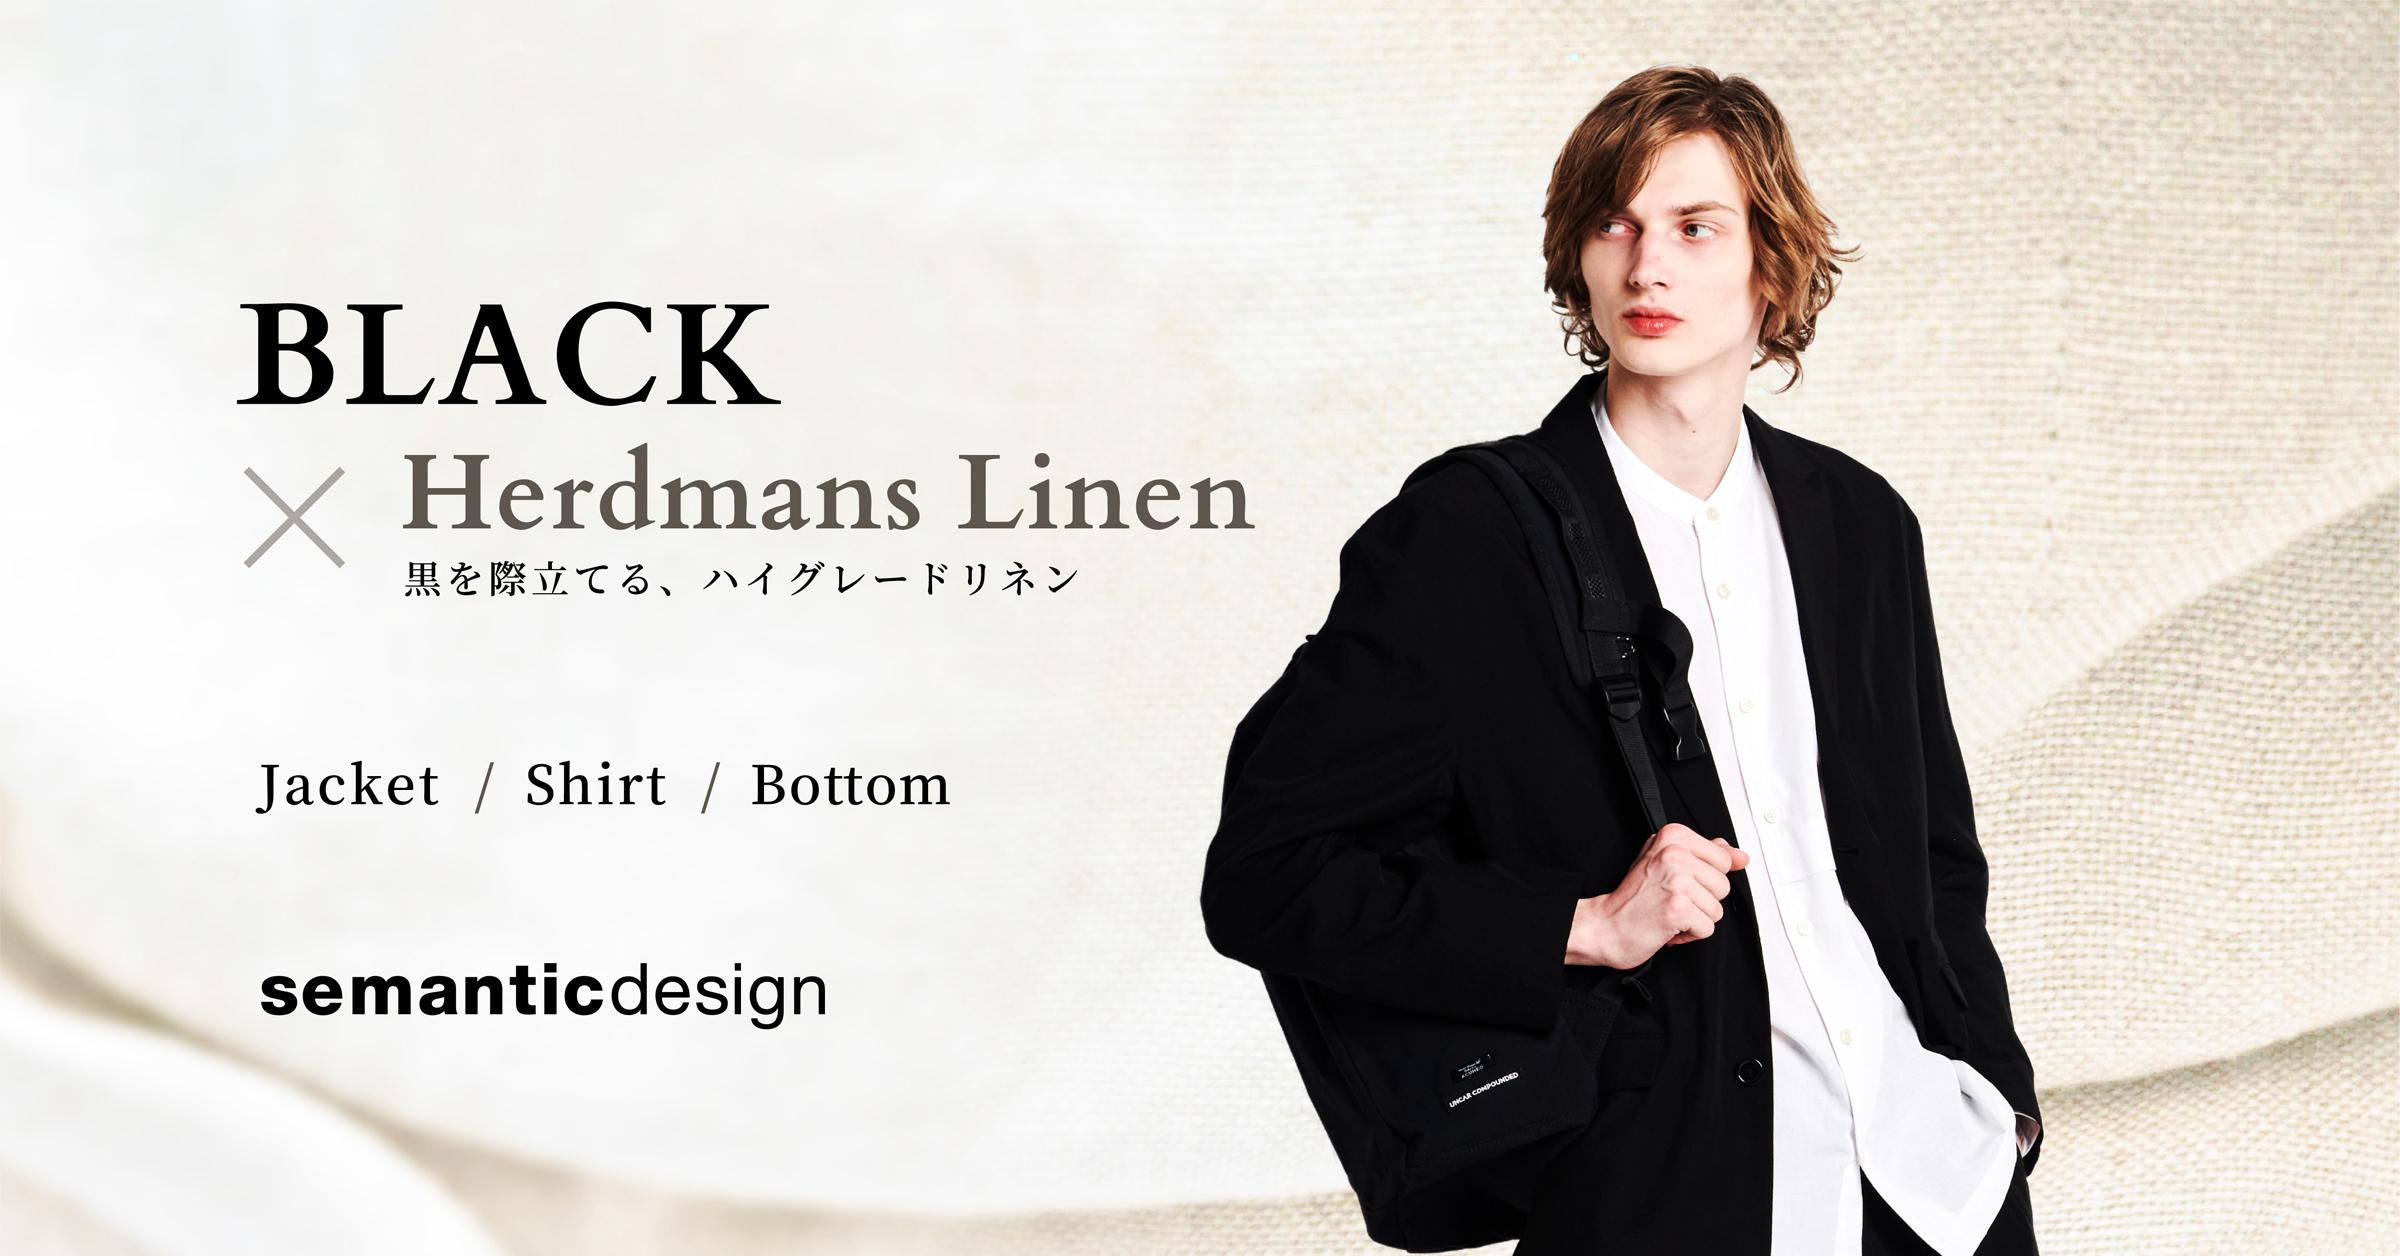 semantic design BLACK×Herdmans Linen